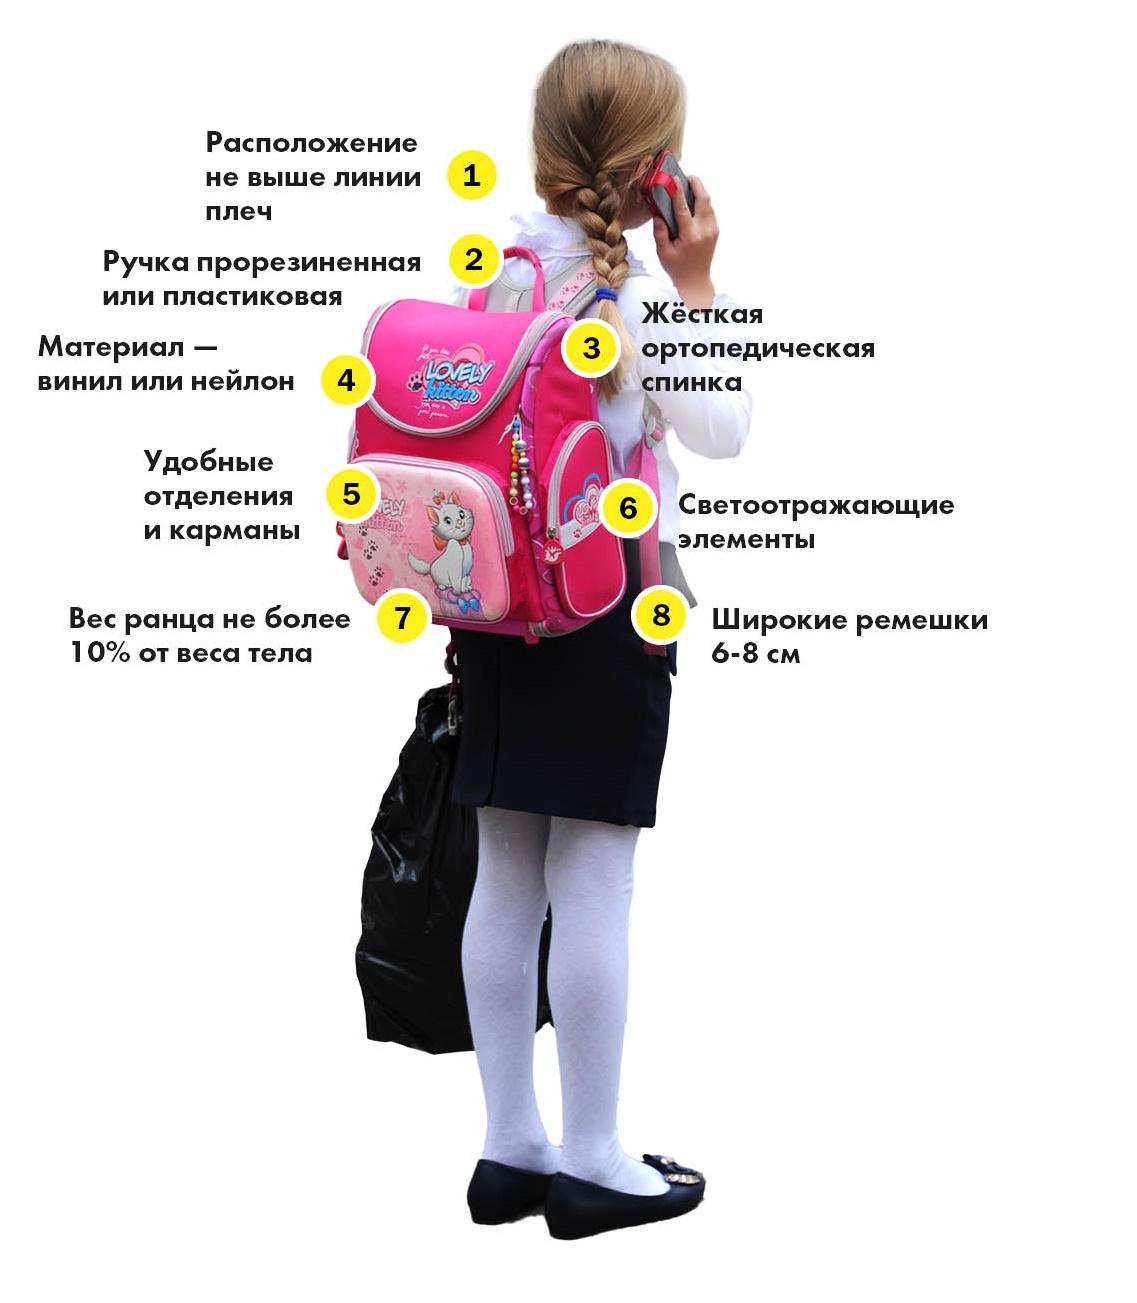 рюкзак с параметрами.jpg